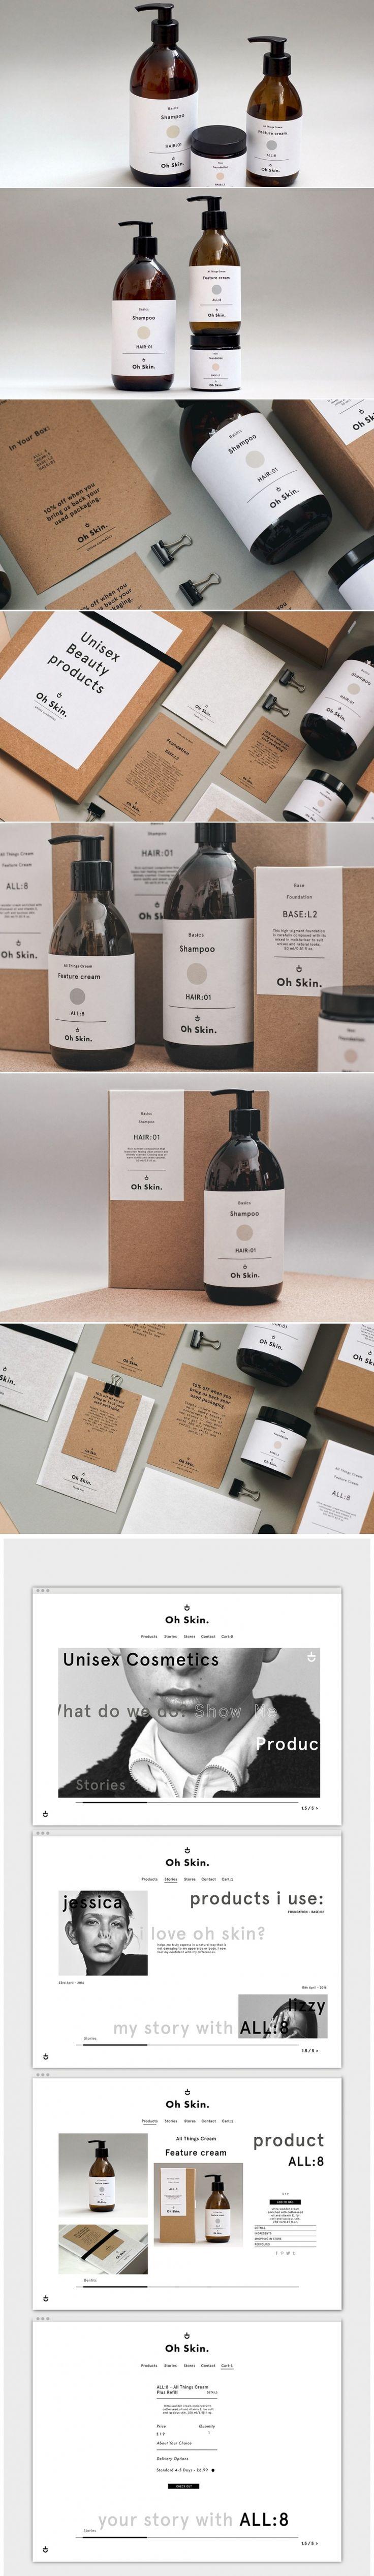 Oh Skin Unisex Cosmetics — The Dieline - Branding & Packaging Design